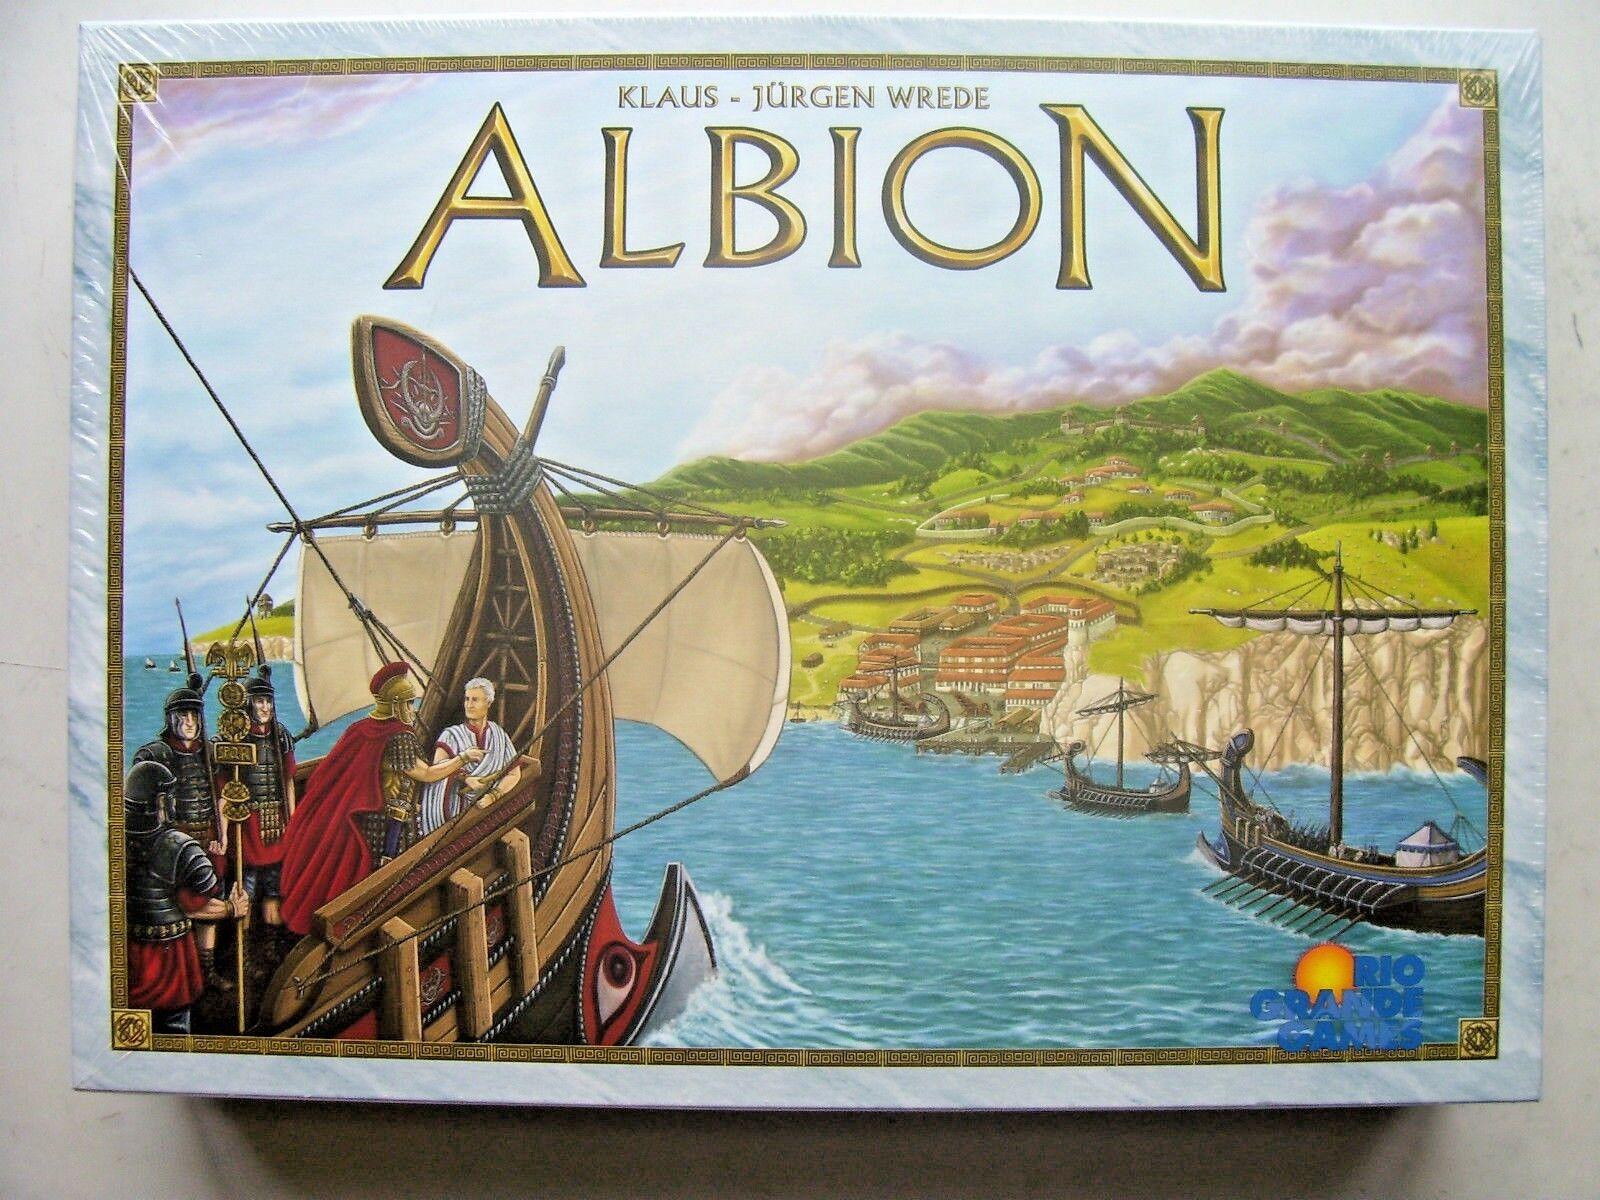 Albion Game Klaus - Jurgen Wrede  Rio Grande Games (New and Sealed)